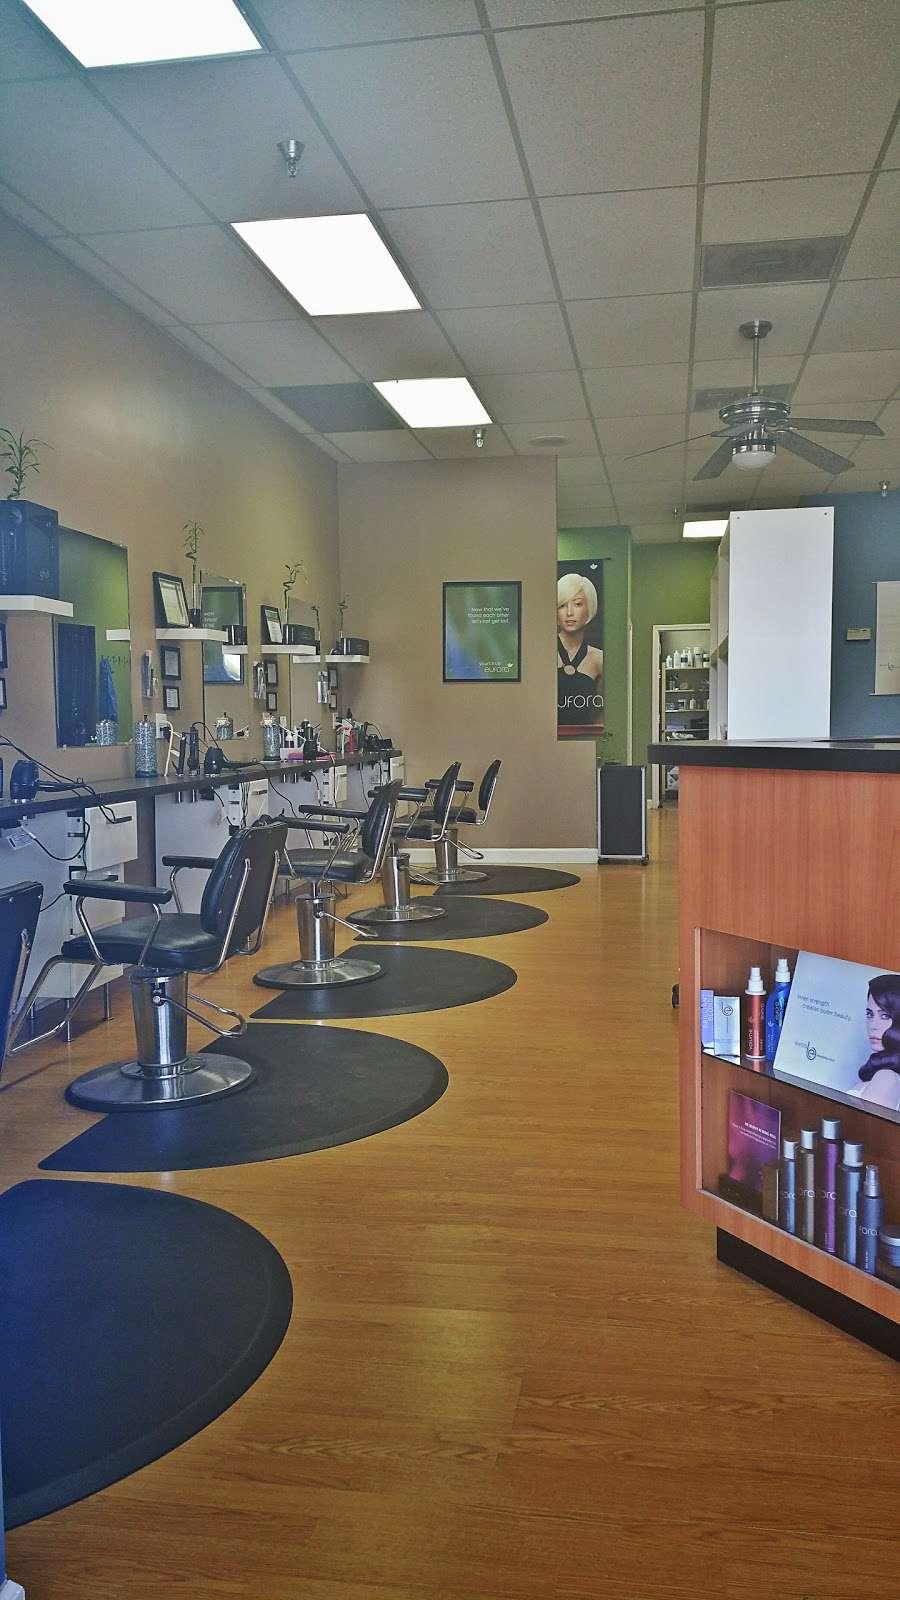 Bab & Company Hairdesigners - hair care  | Photo 1 of 10 | Address: 12528 N Gray Road, Carmel, IN 46033, USA | Phone: (317) 844-8885